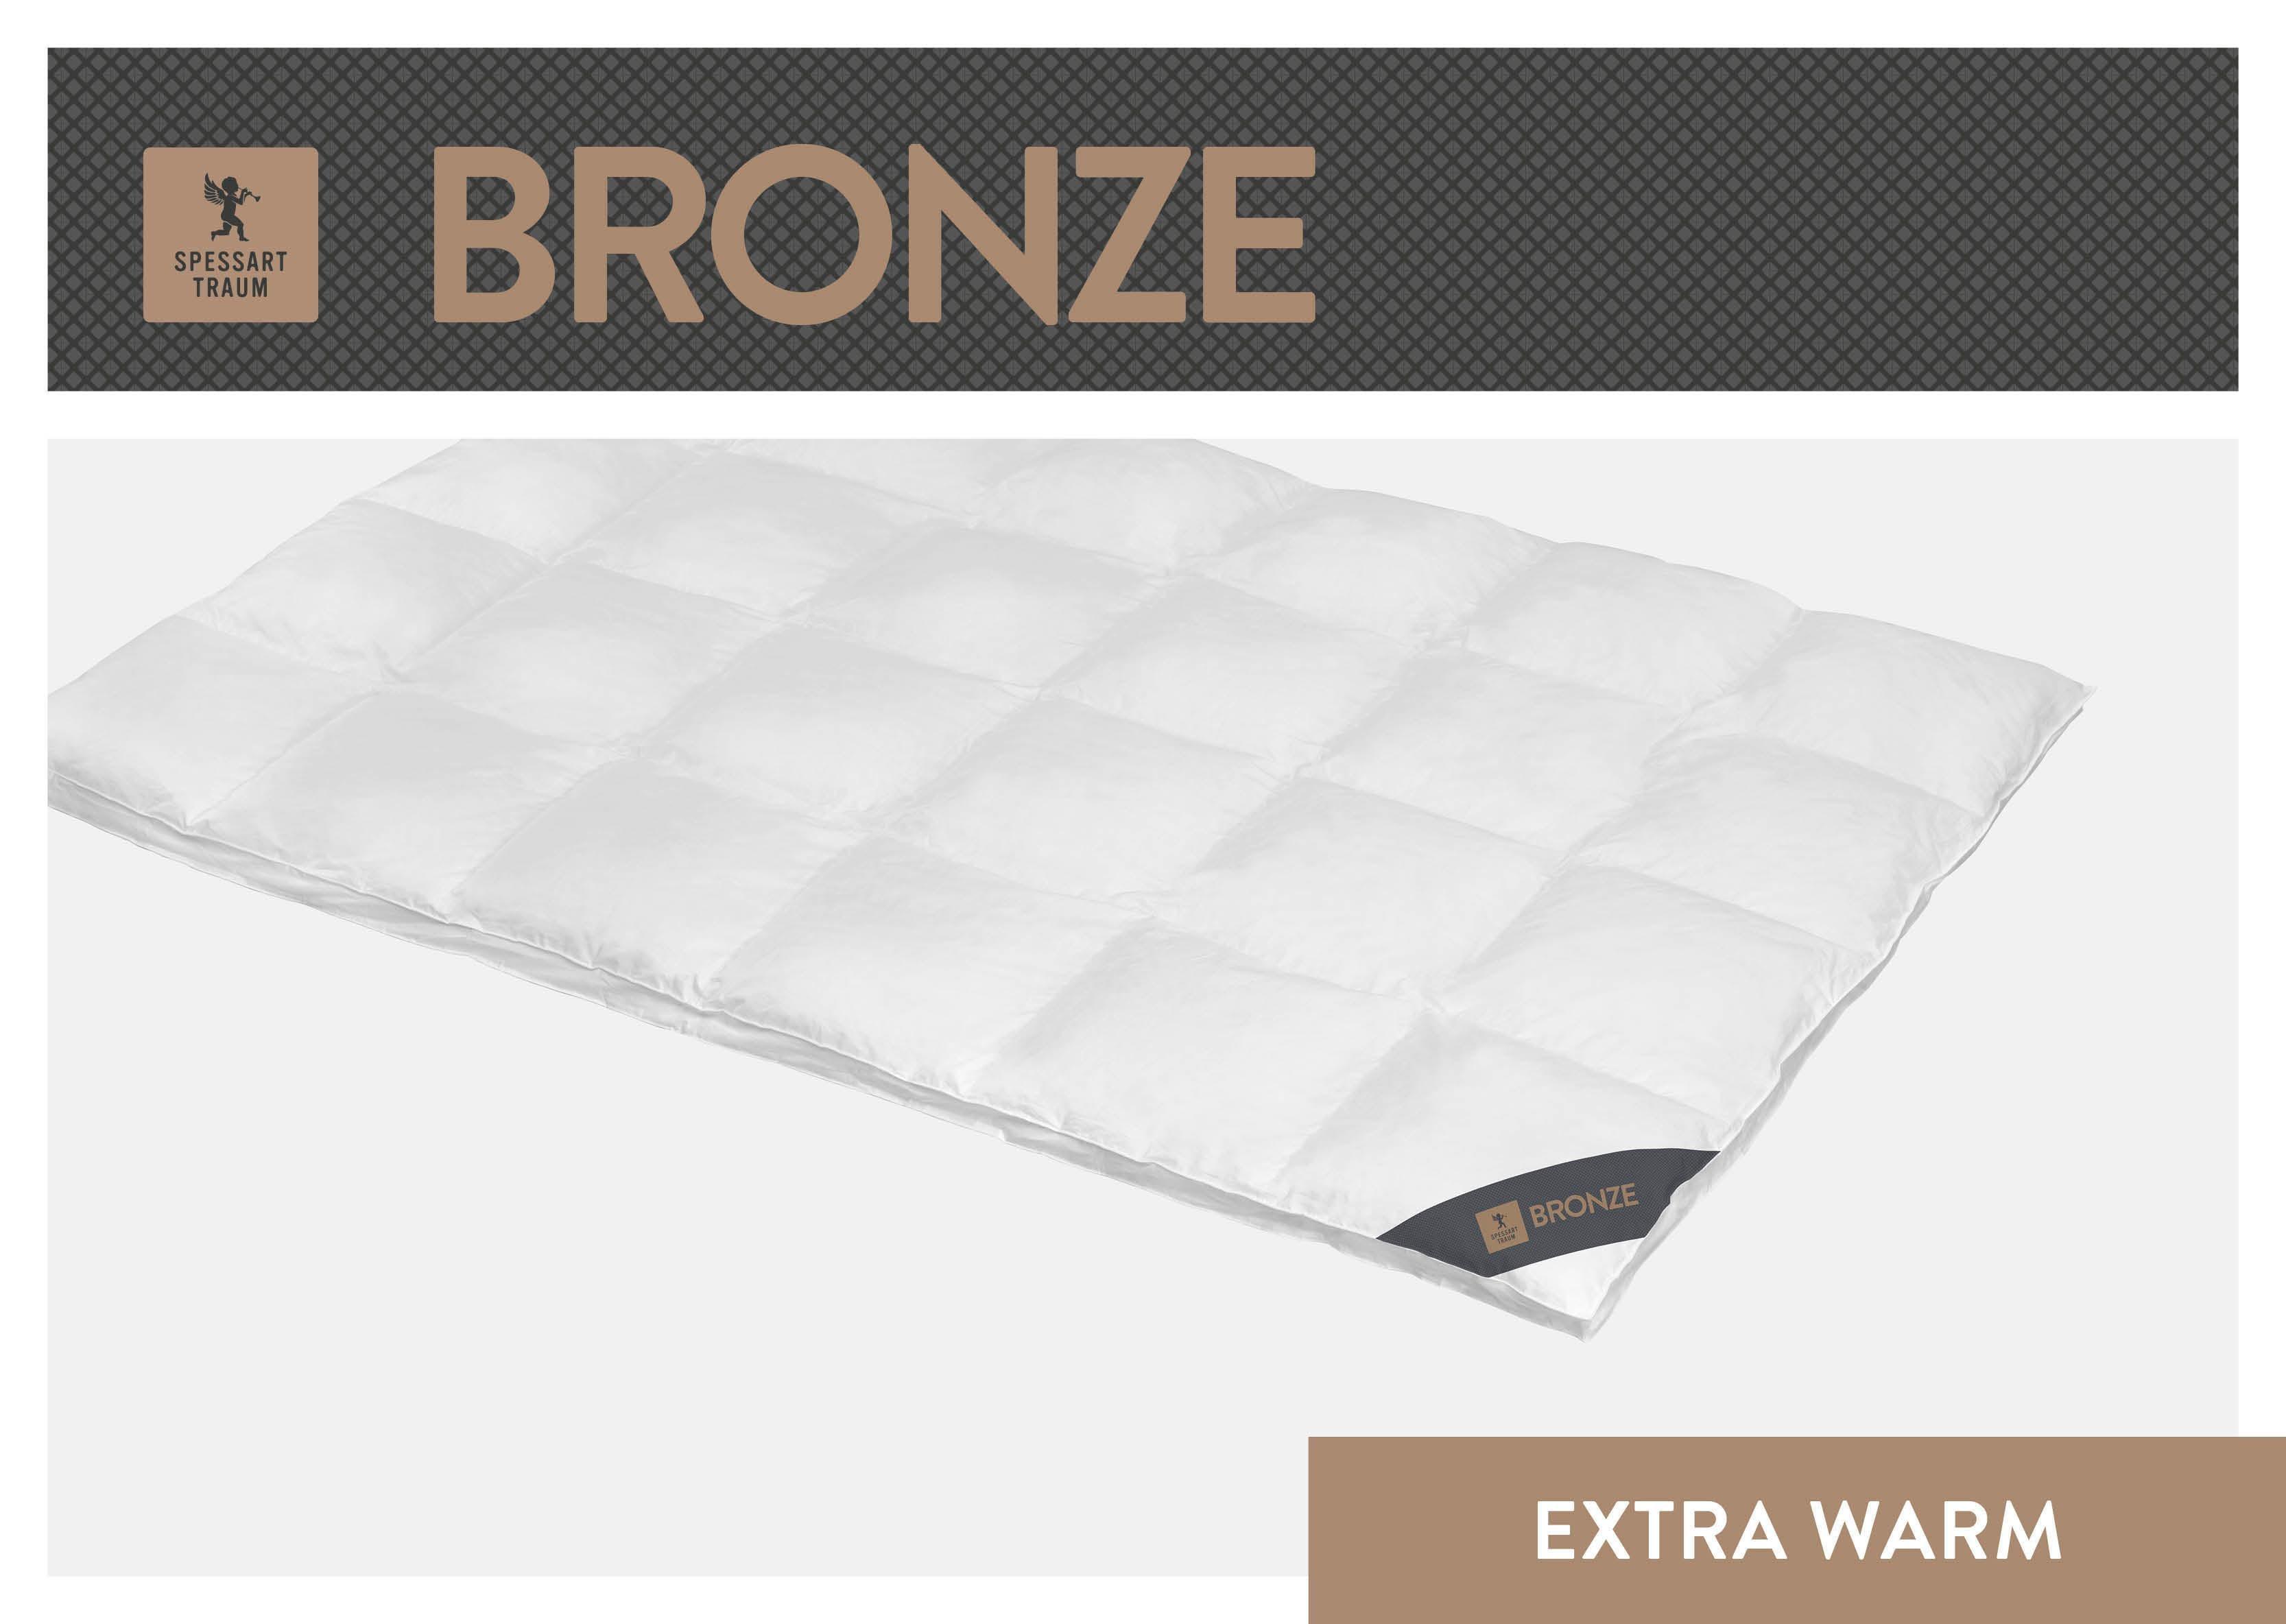 Daunenbettdecke Bronze SPESSARTTRAUM extrawarm Füllung: 90% Daunen 10% Federn Bezug: 100% Baumwolle